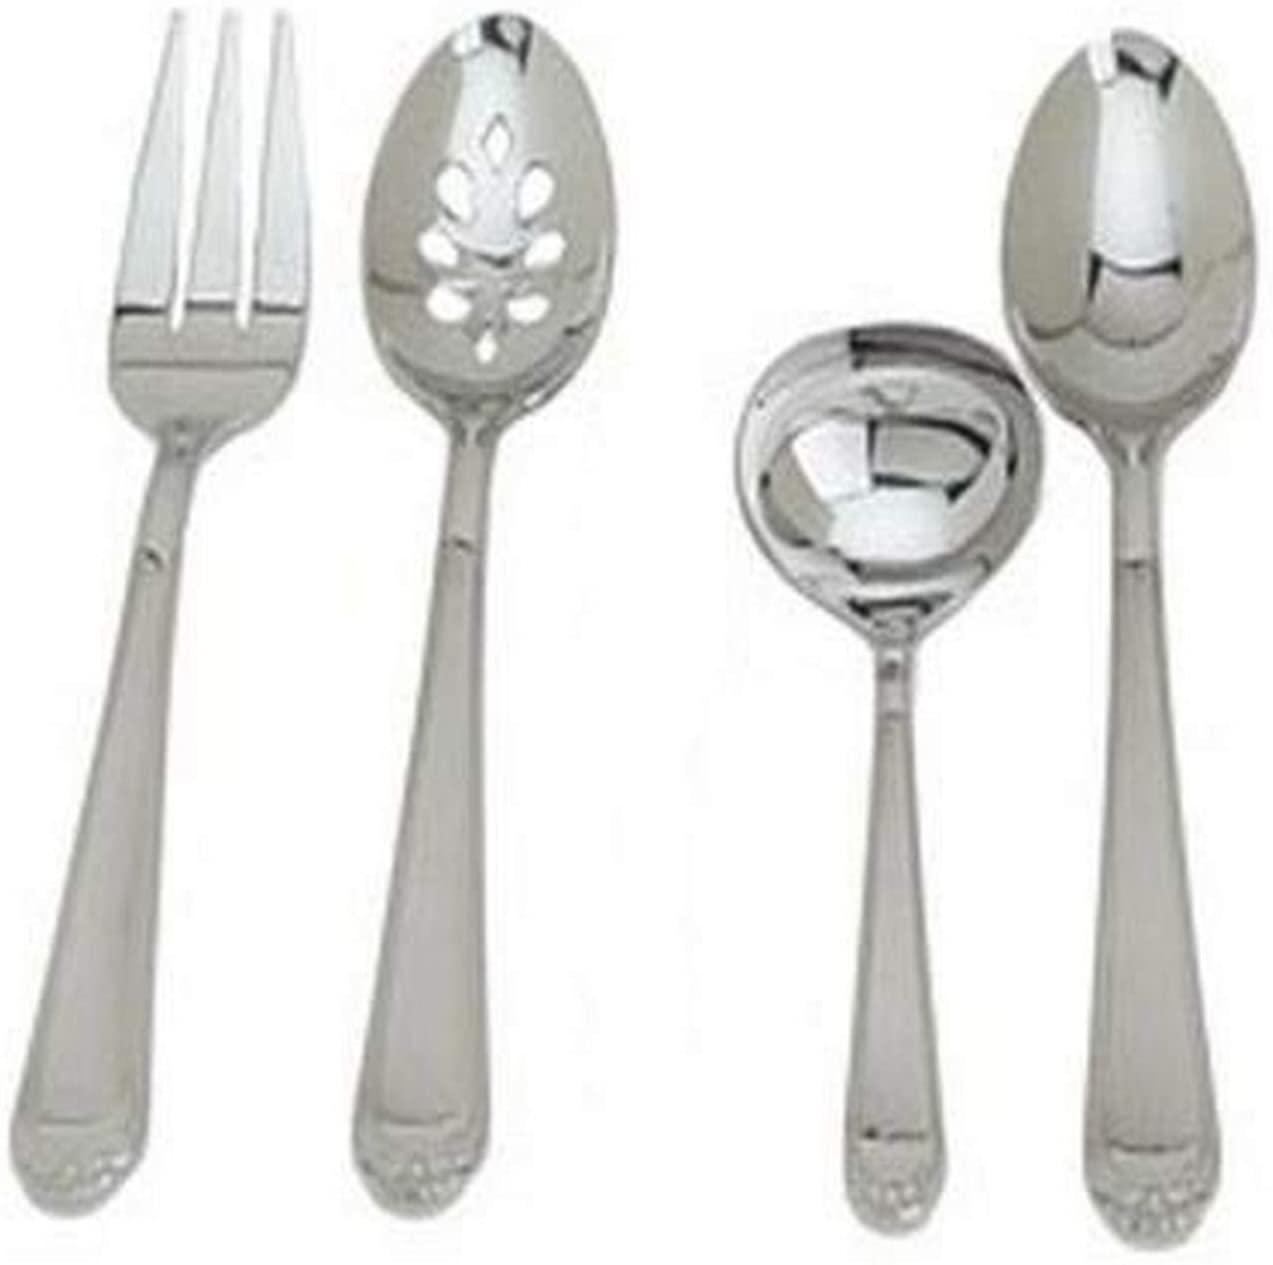 Ginkgo International Coquille Flatware Set, 4 pieces, Silver